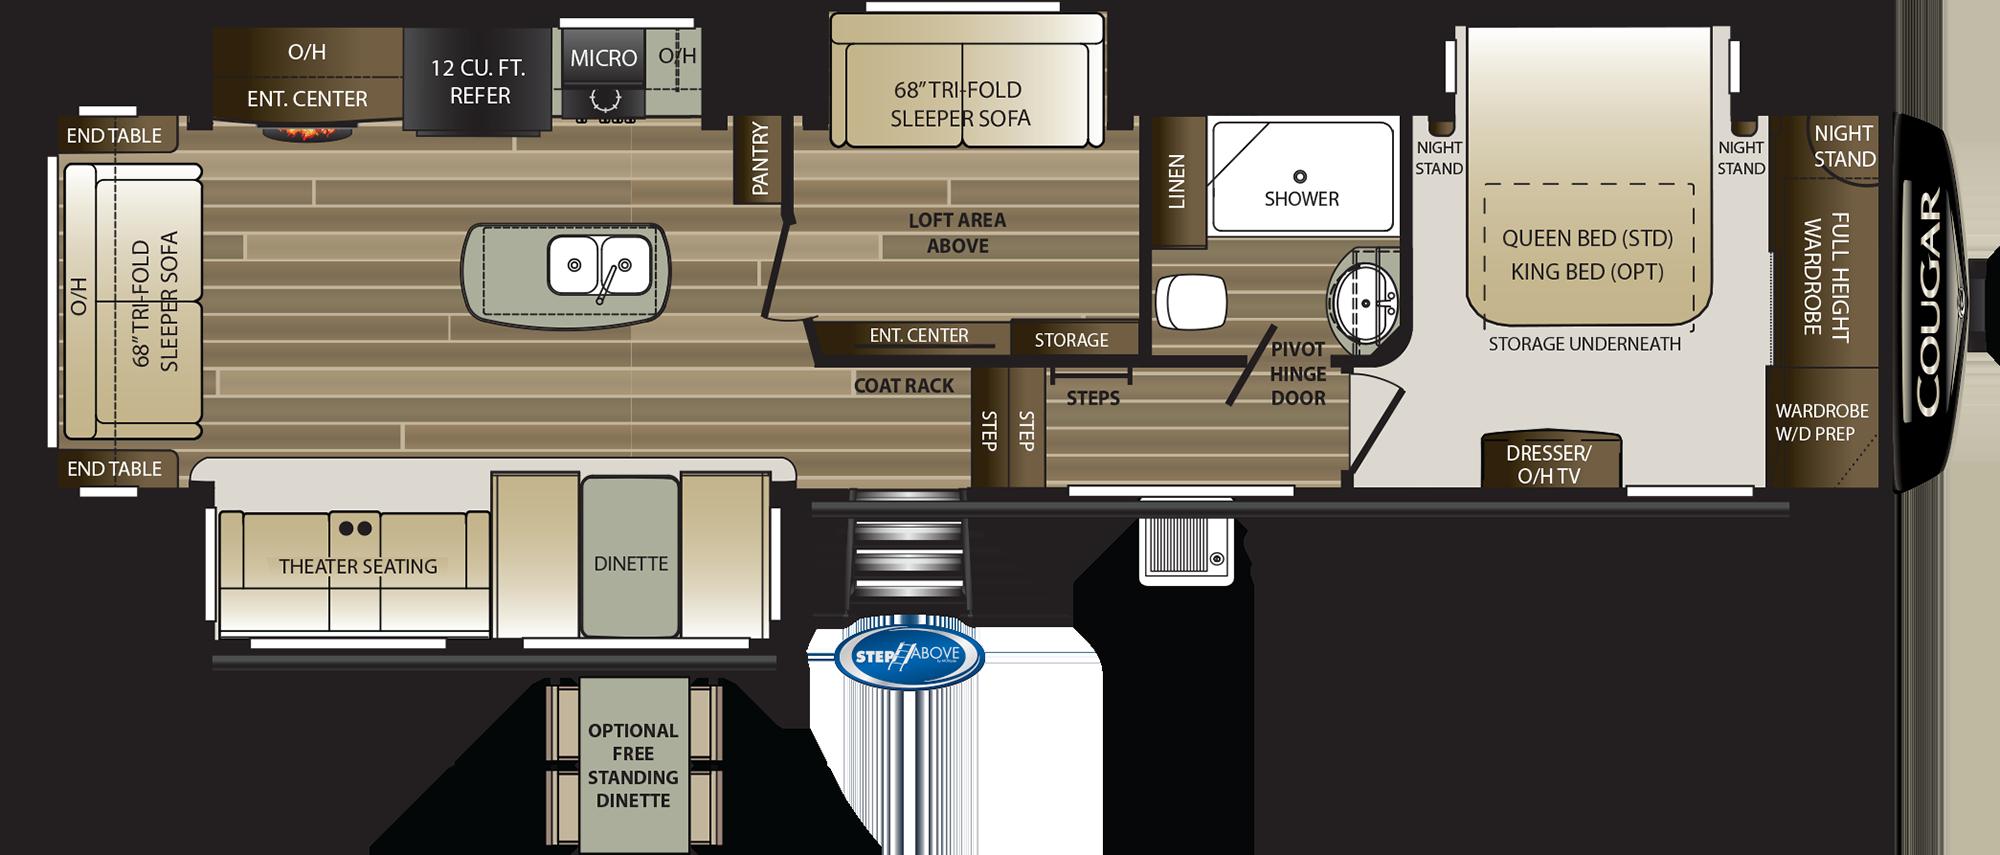 2019 KEYSTONE COUGAR 368MBI (bunks) Floorplan